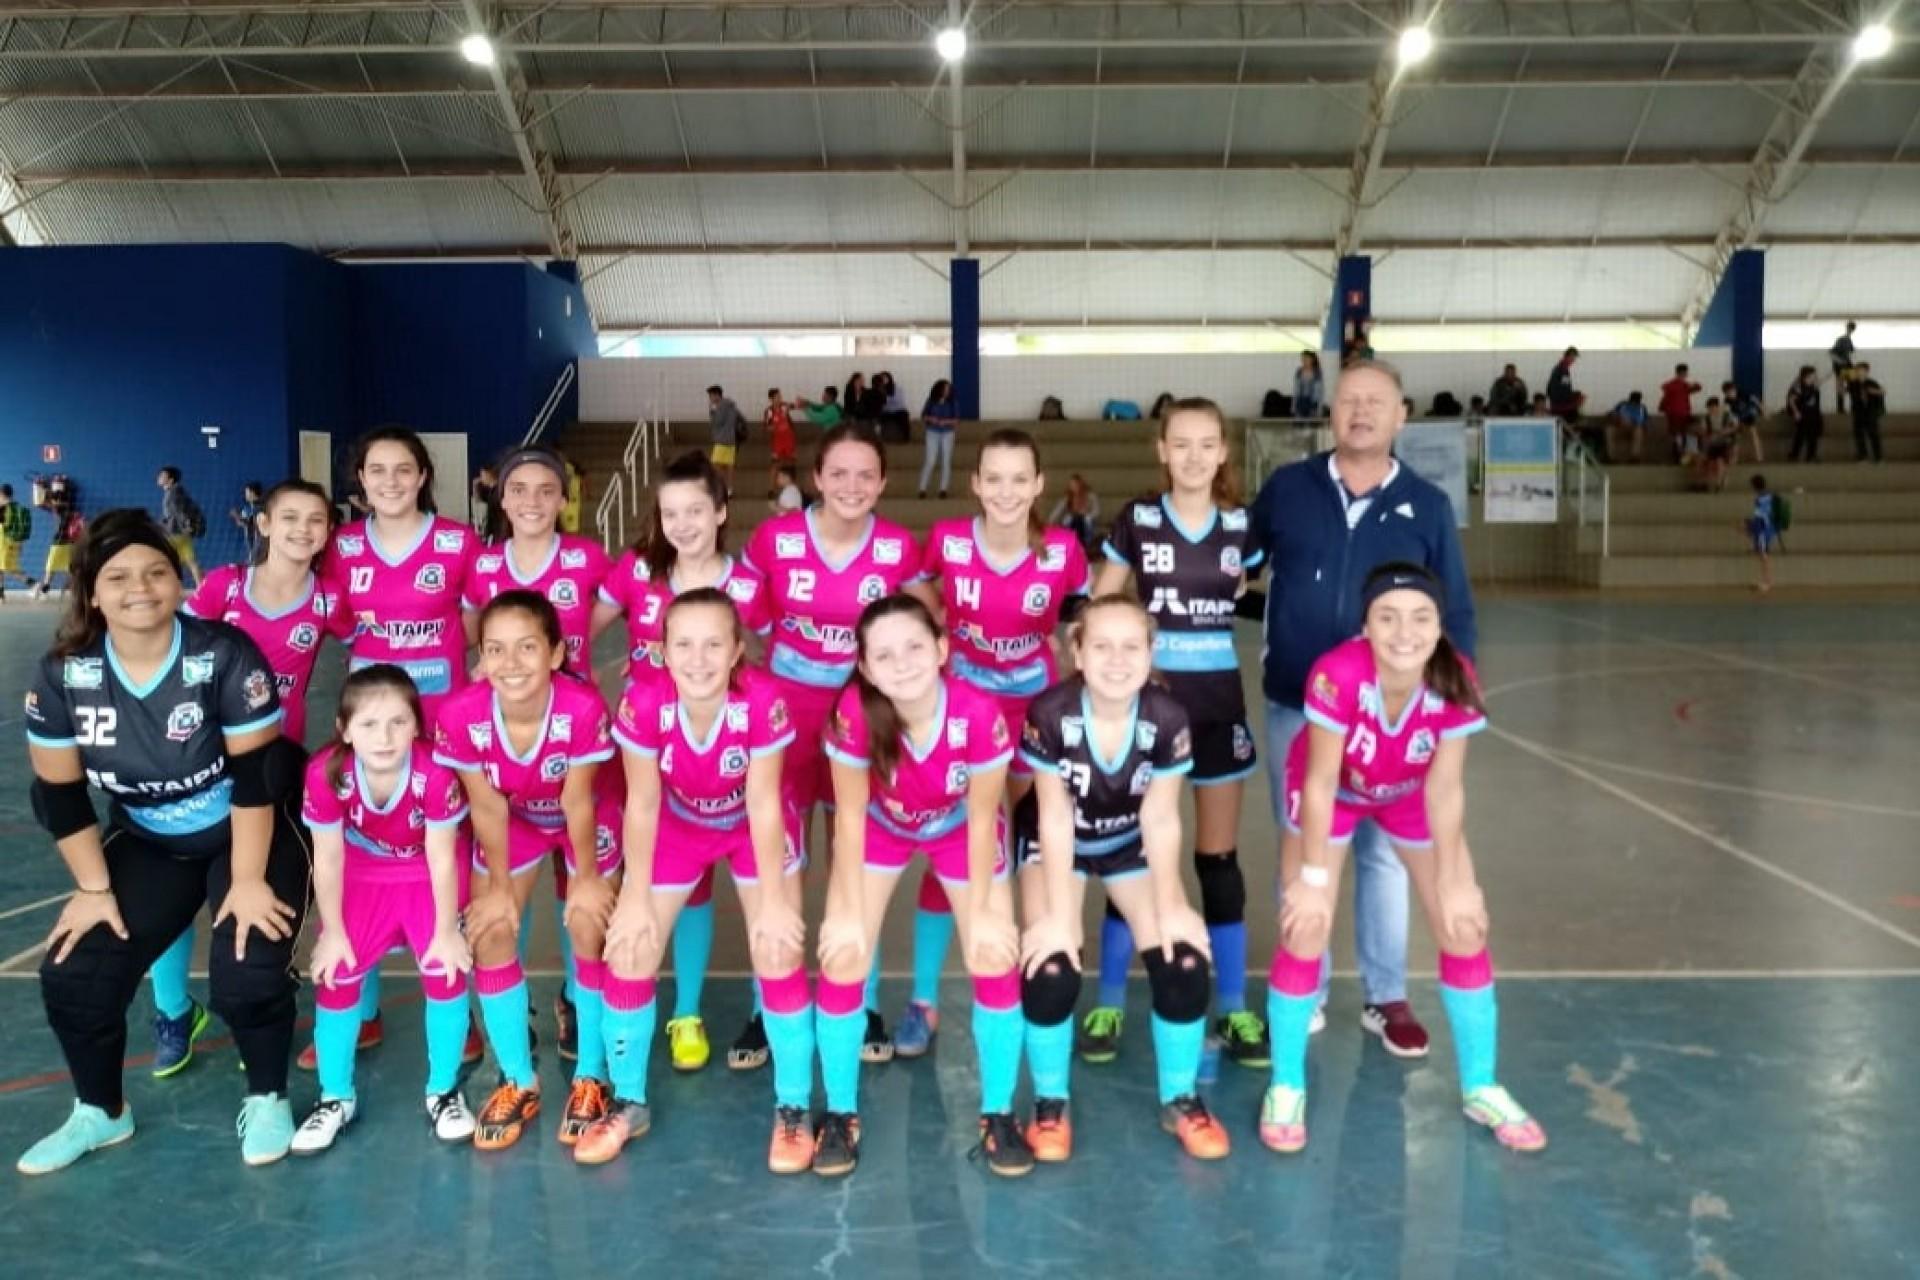 Equipe feminina do Missal Futsal vence mais uma pela Copa Sesc de Futsal Sub-14